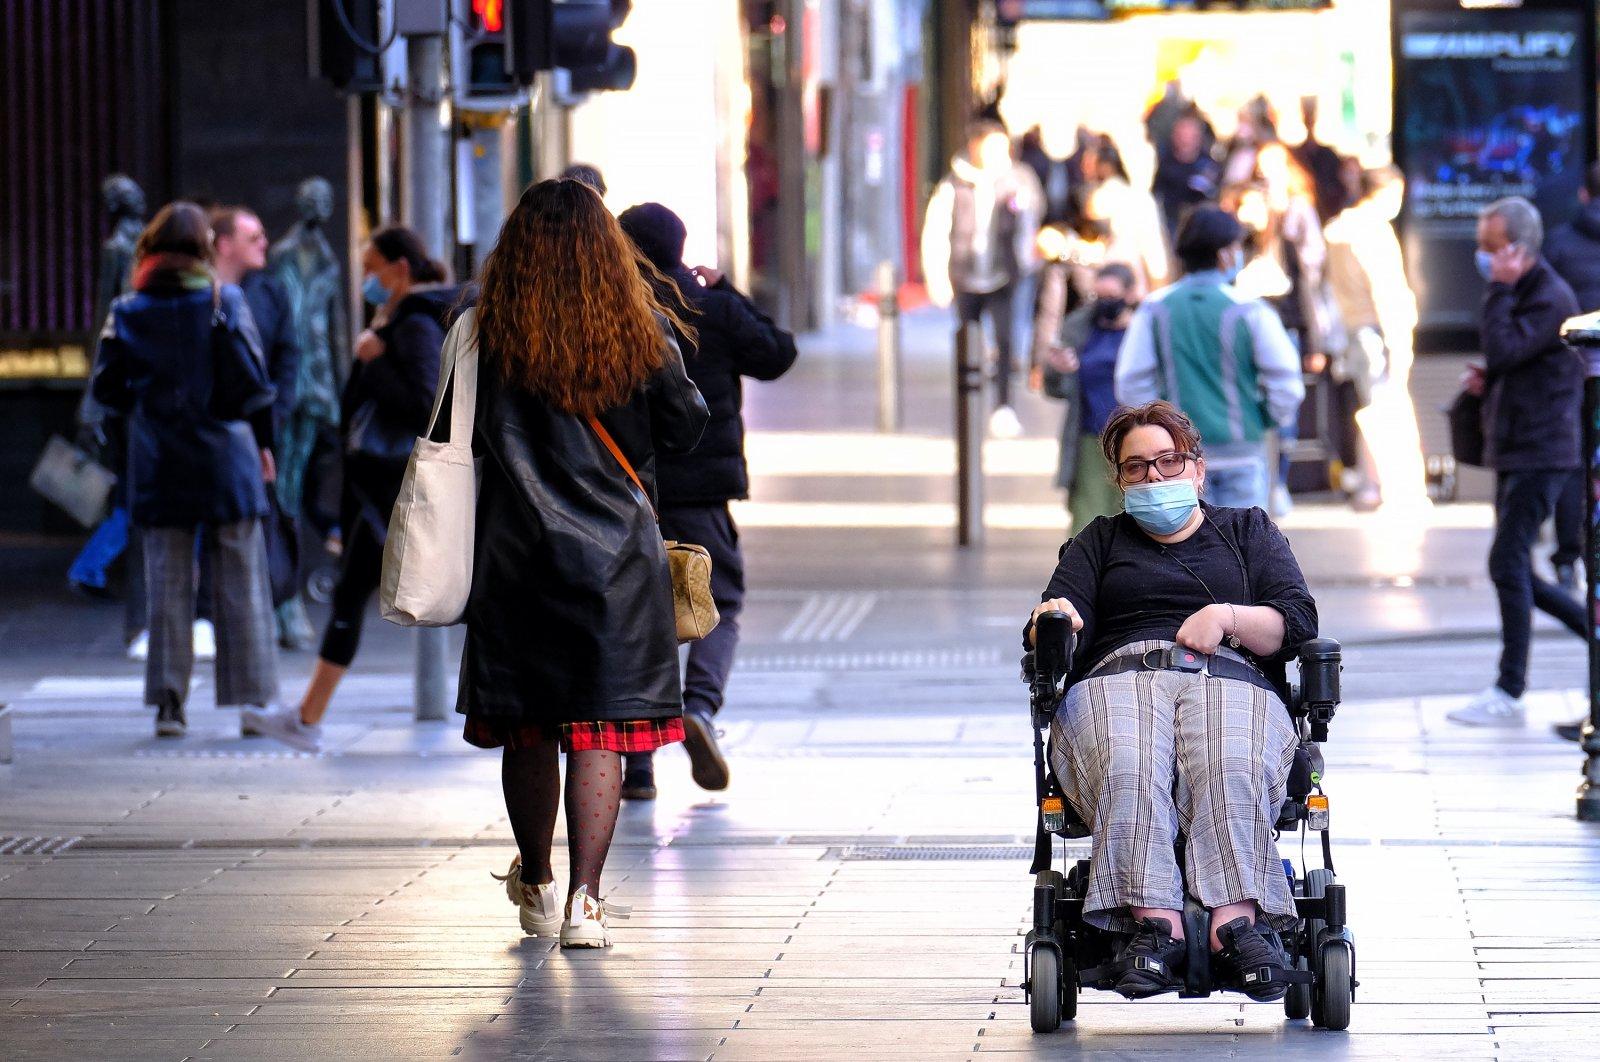 People wearing face masks walk in the CBD of Melbourne, Victoria, Australia, July 15, 2021. (EPA Photo)